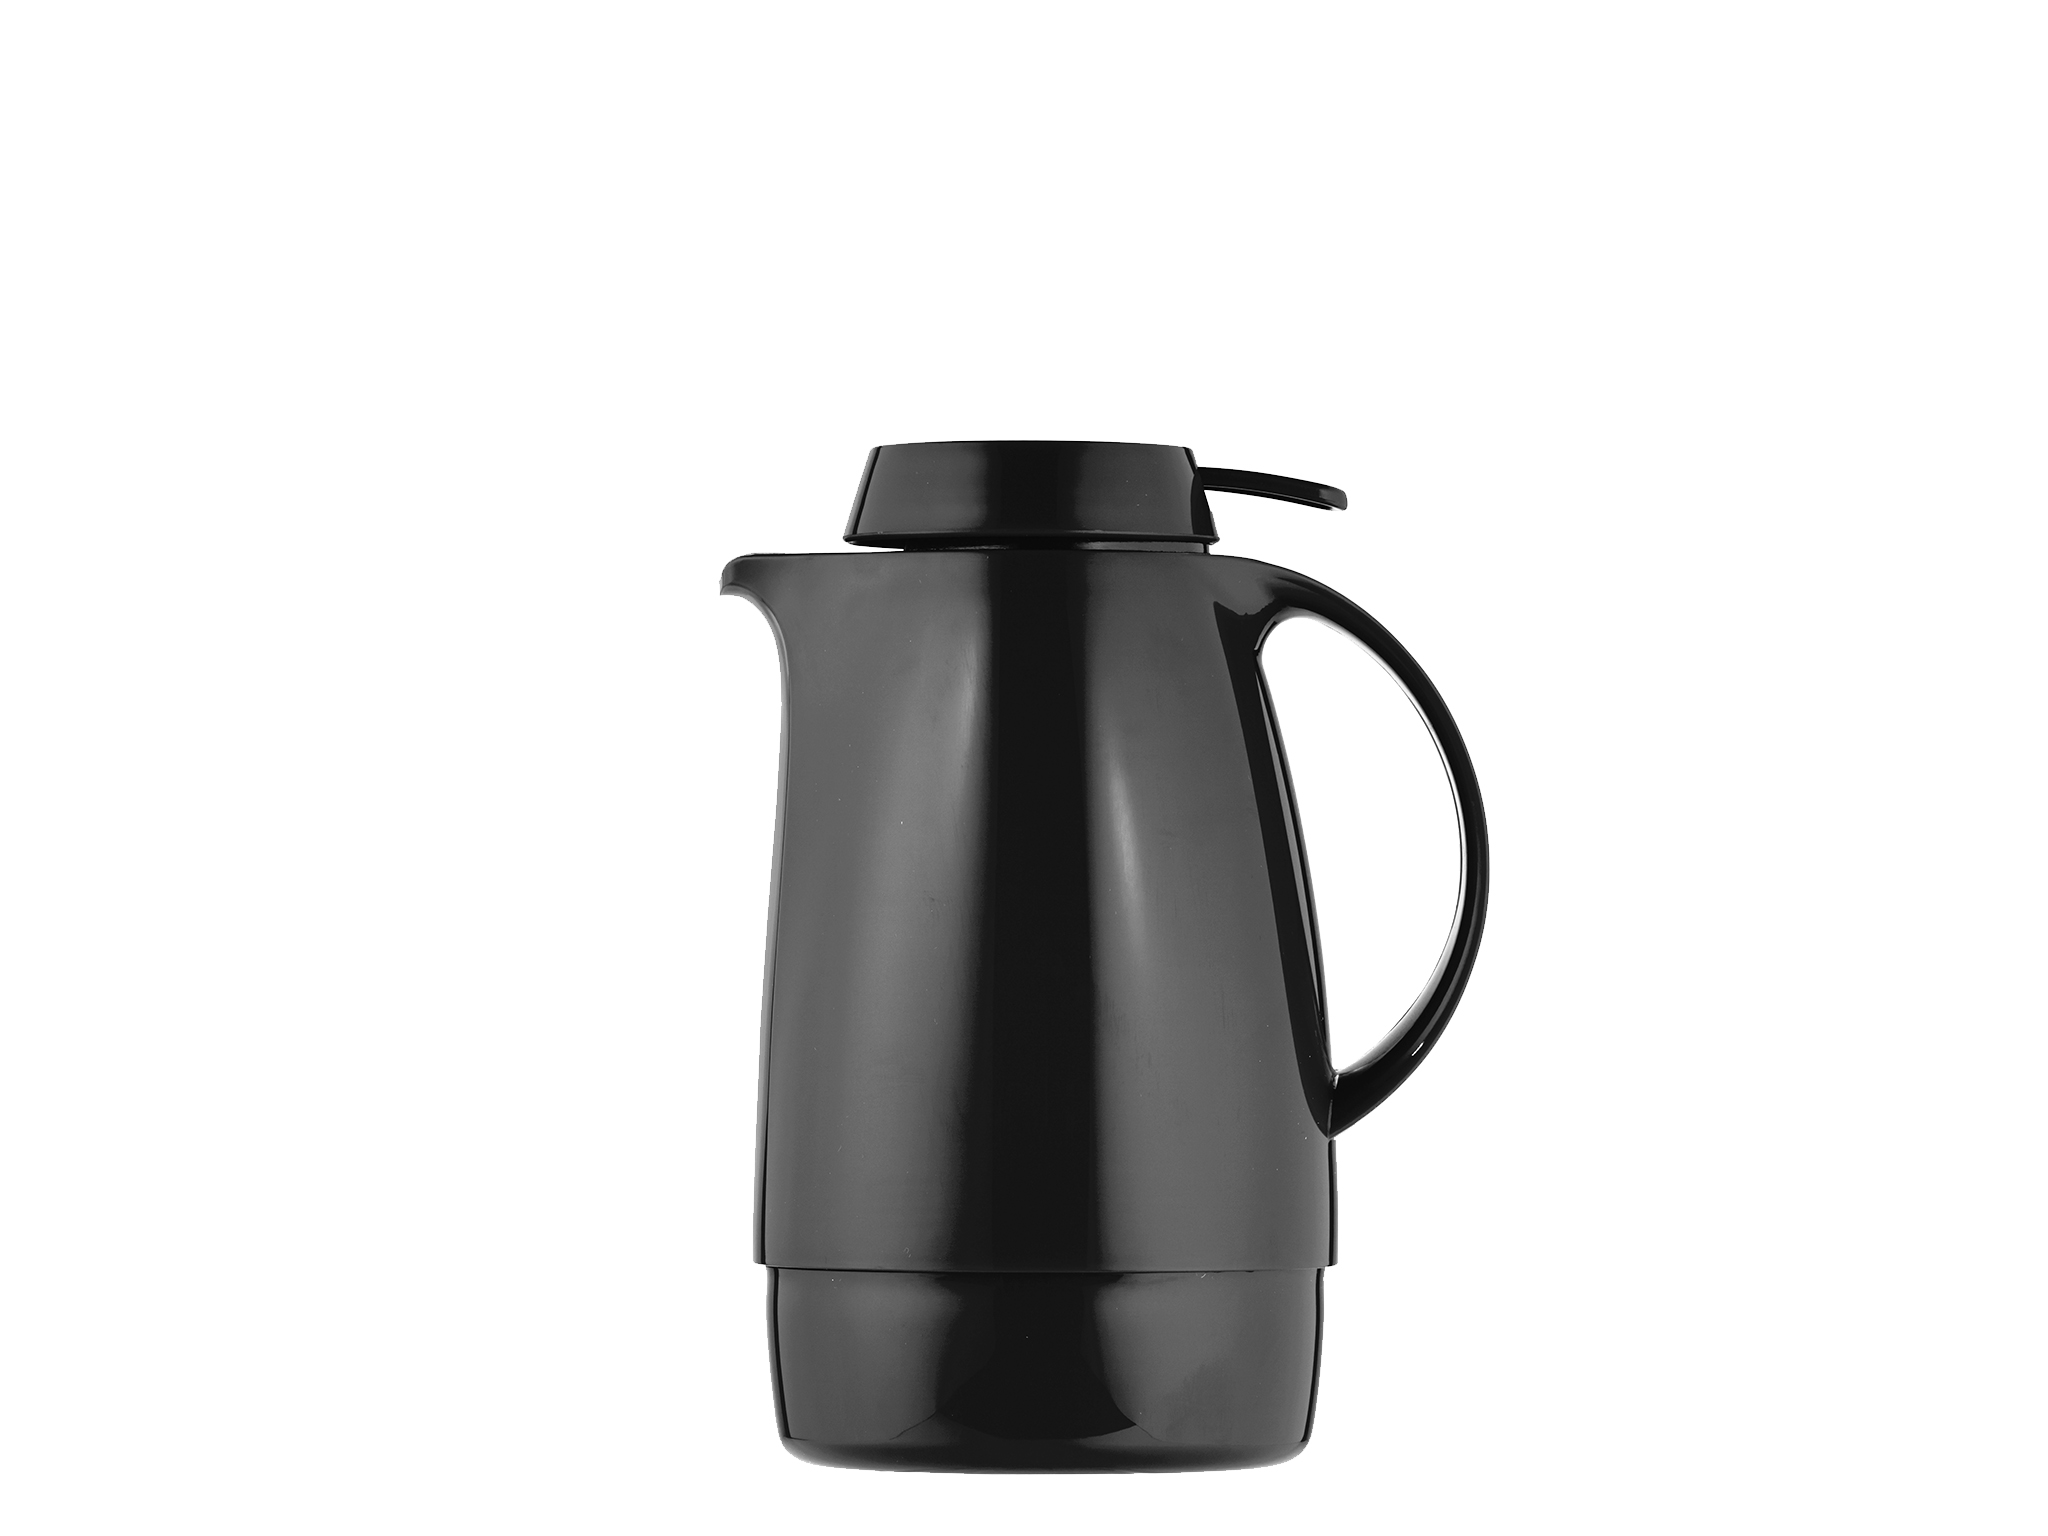 7202-002 - Vacuum carafe black 0.6 L SERVITHERM - Helios